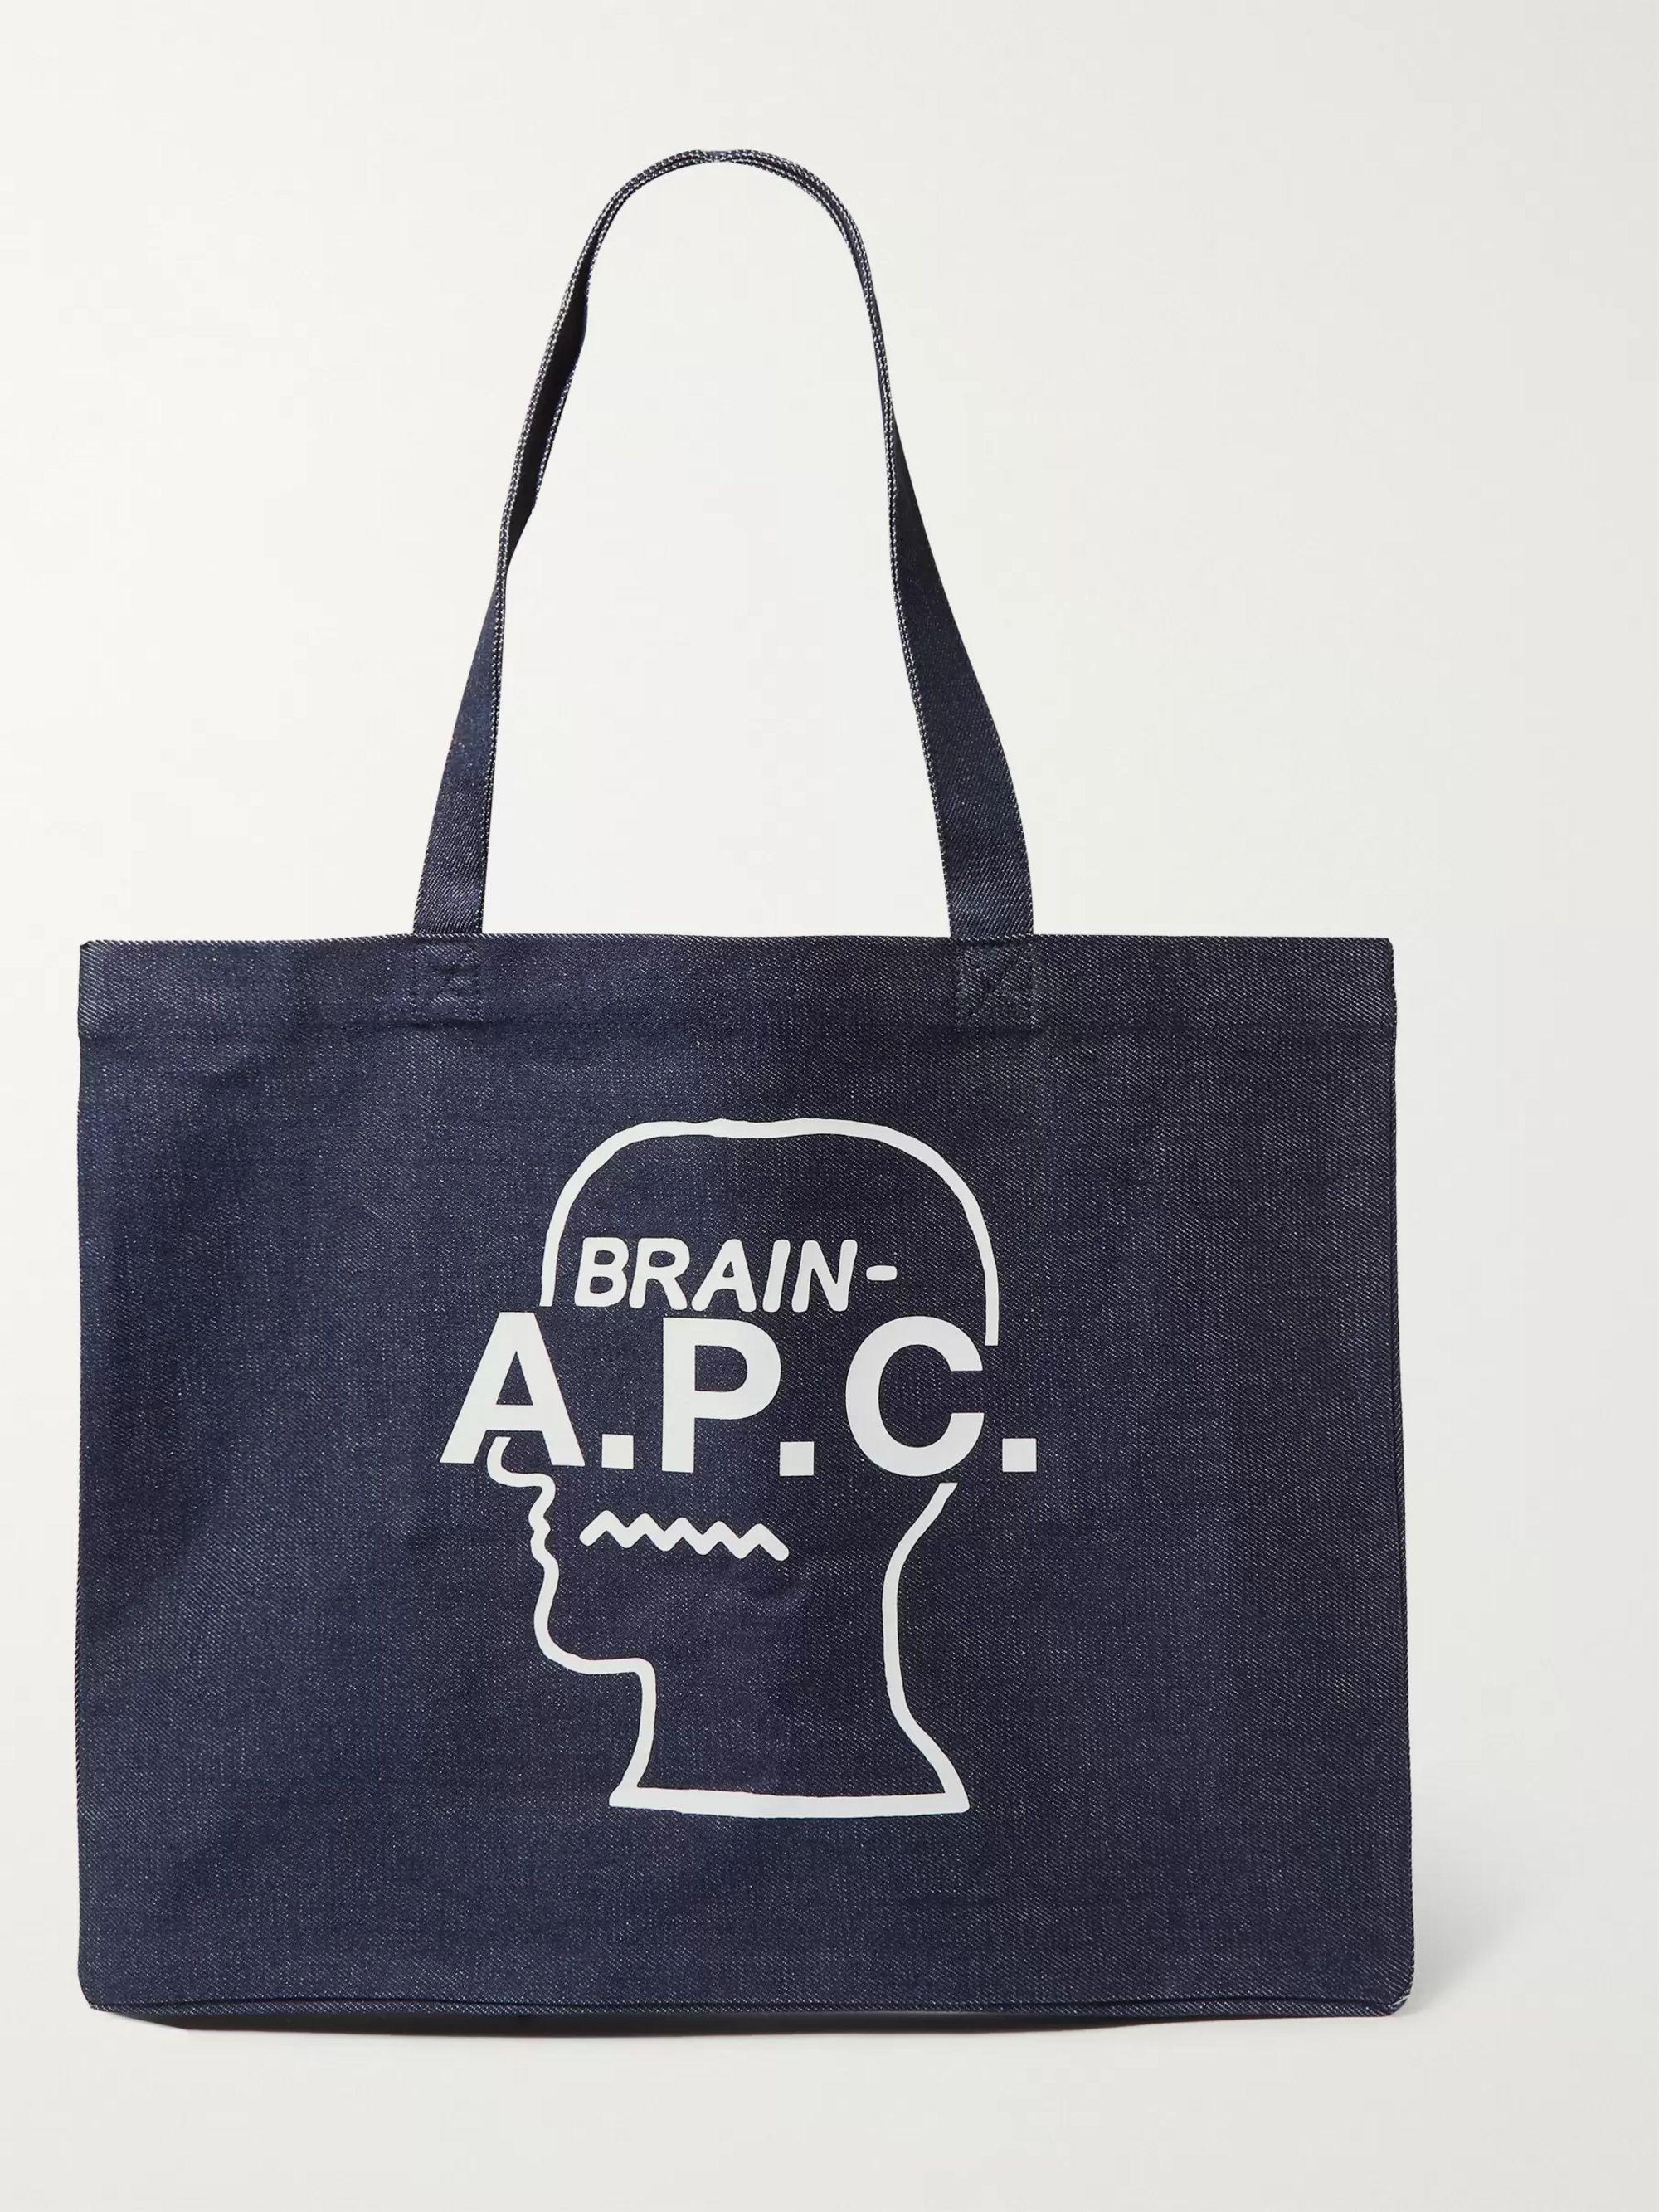 + Brain Dead Logo Print Indigo Dyed Denim Tote Bag by A.P.C.